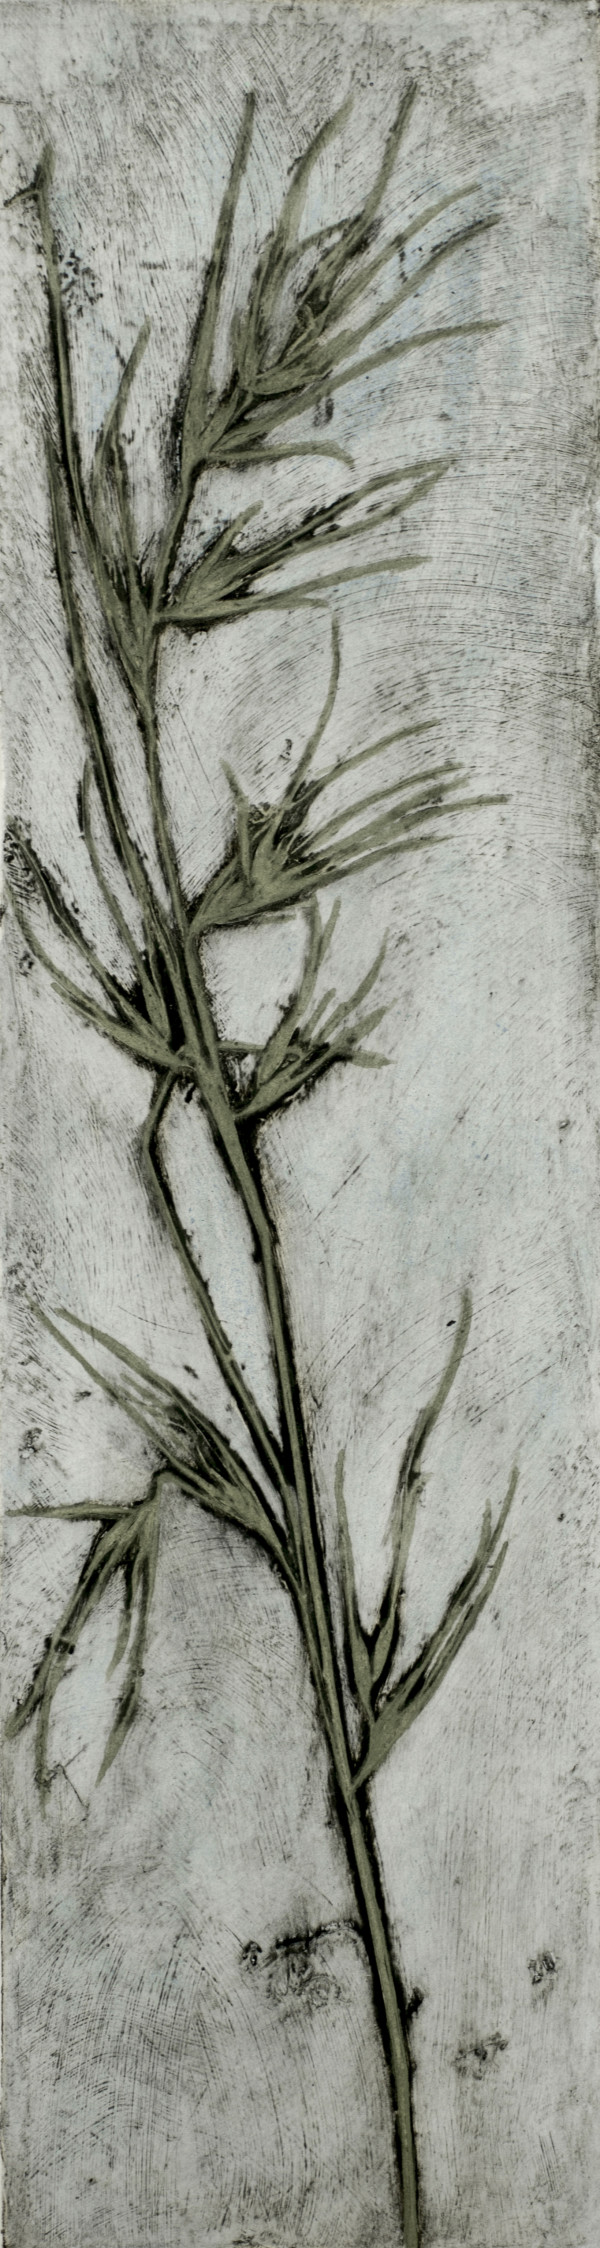 Kangaroo Grass 2 1/5 by Jacky Lowry